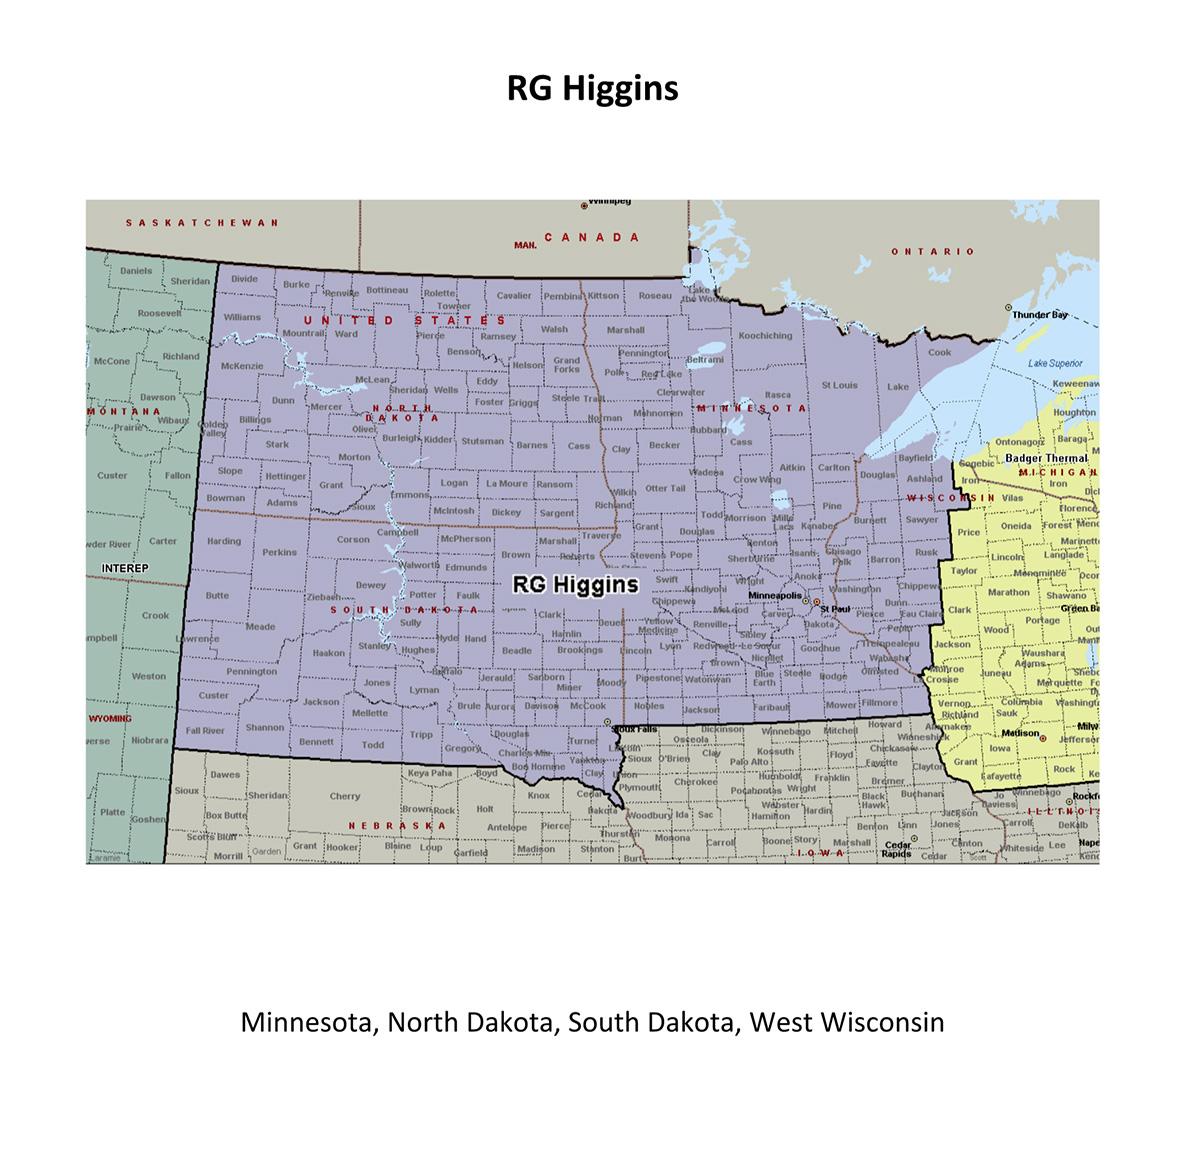 Adsco Rep RG Higgins